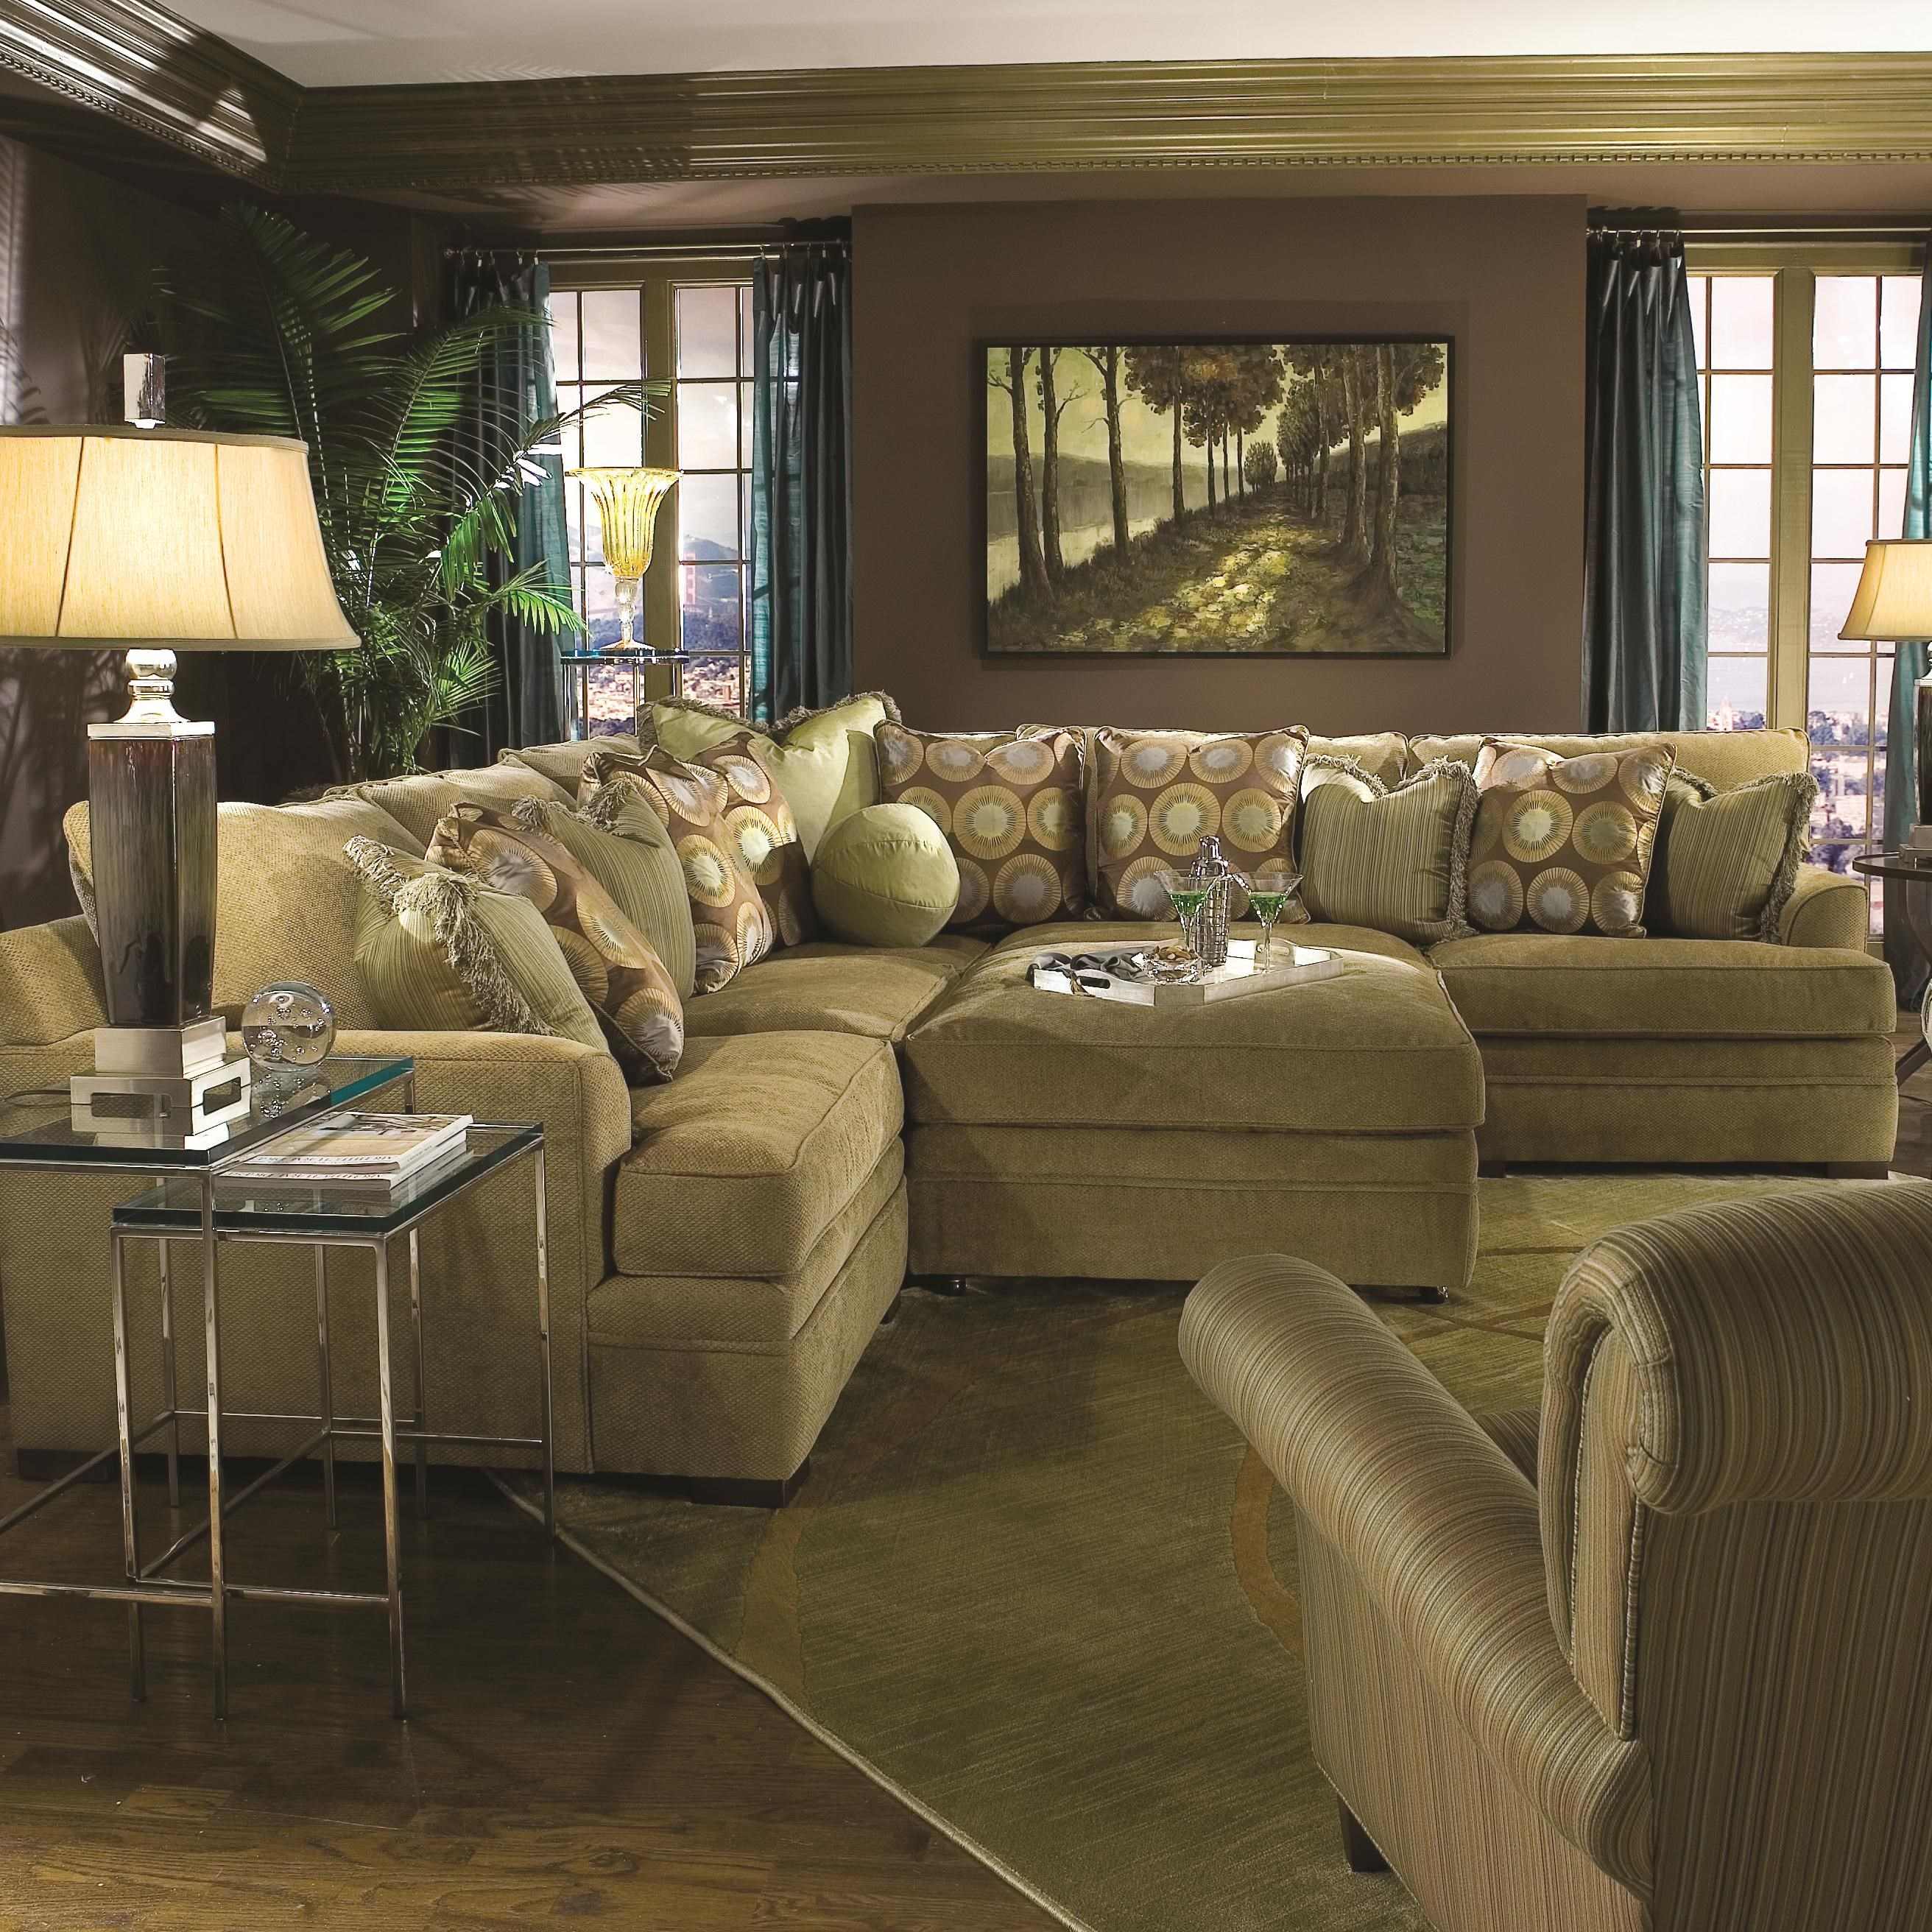 huntington house 7100 casual contemporary l shape sectional sofa rh wayside furniture com Parker House Huntington Table Huntington House Sectional